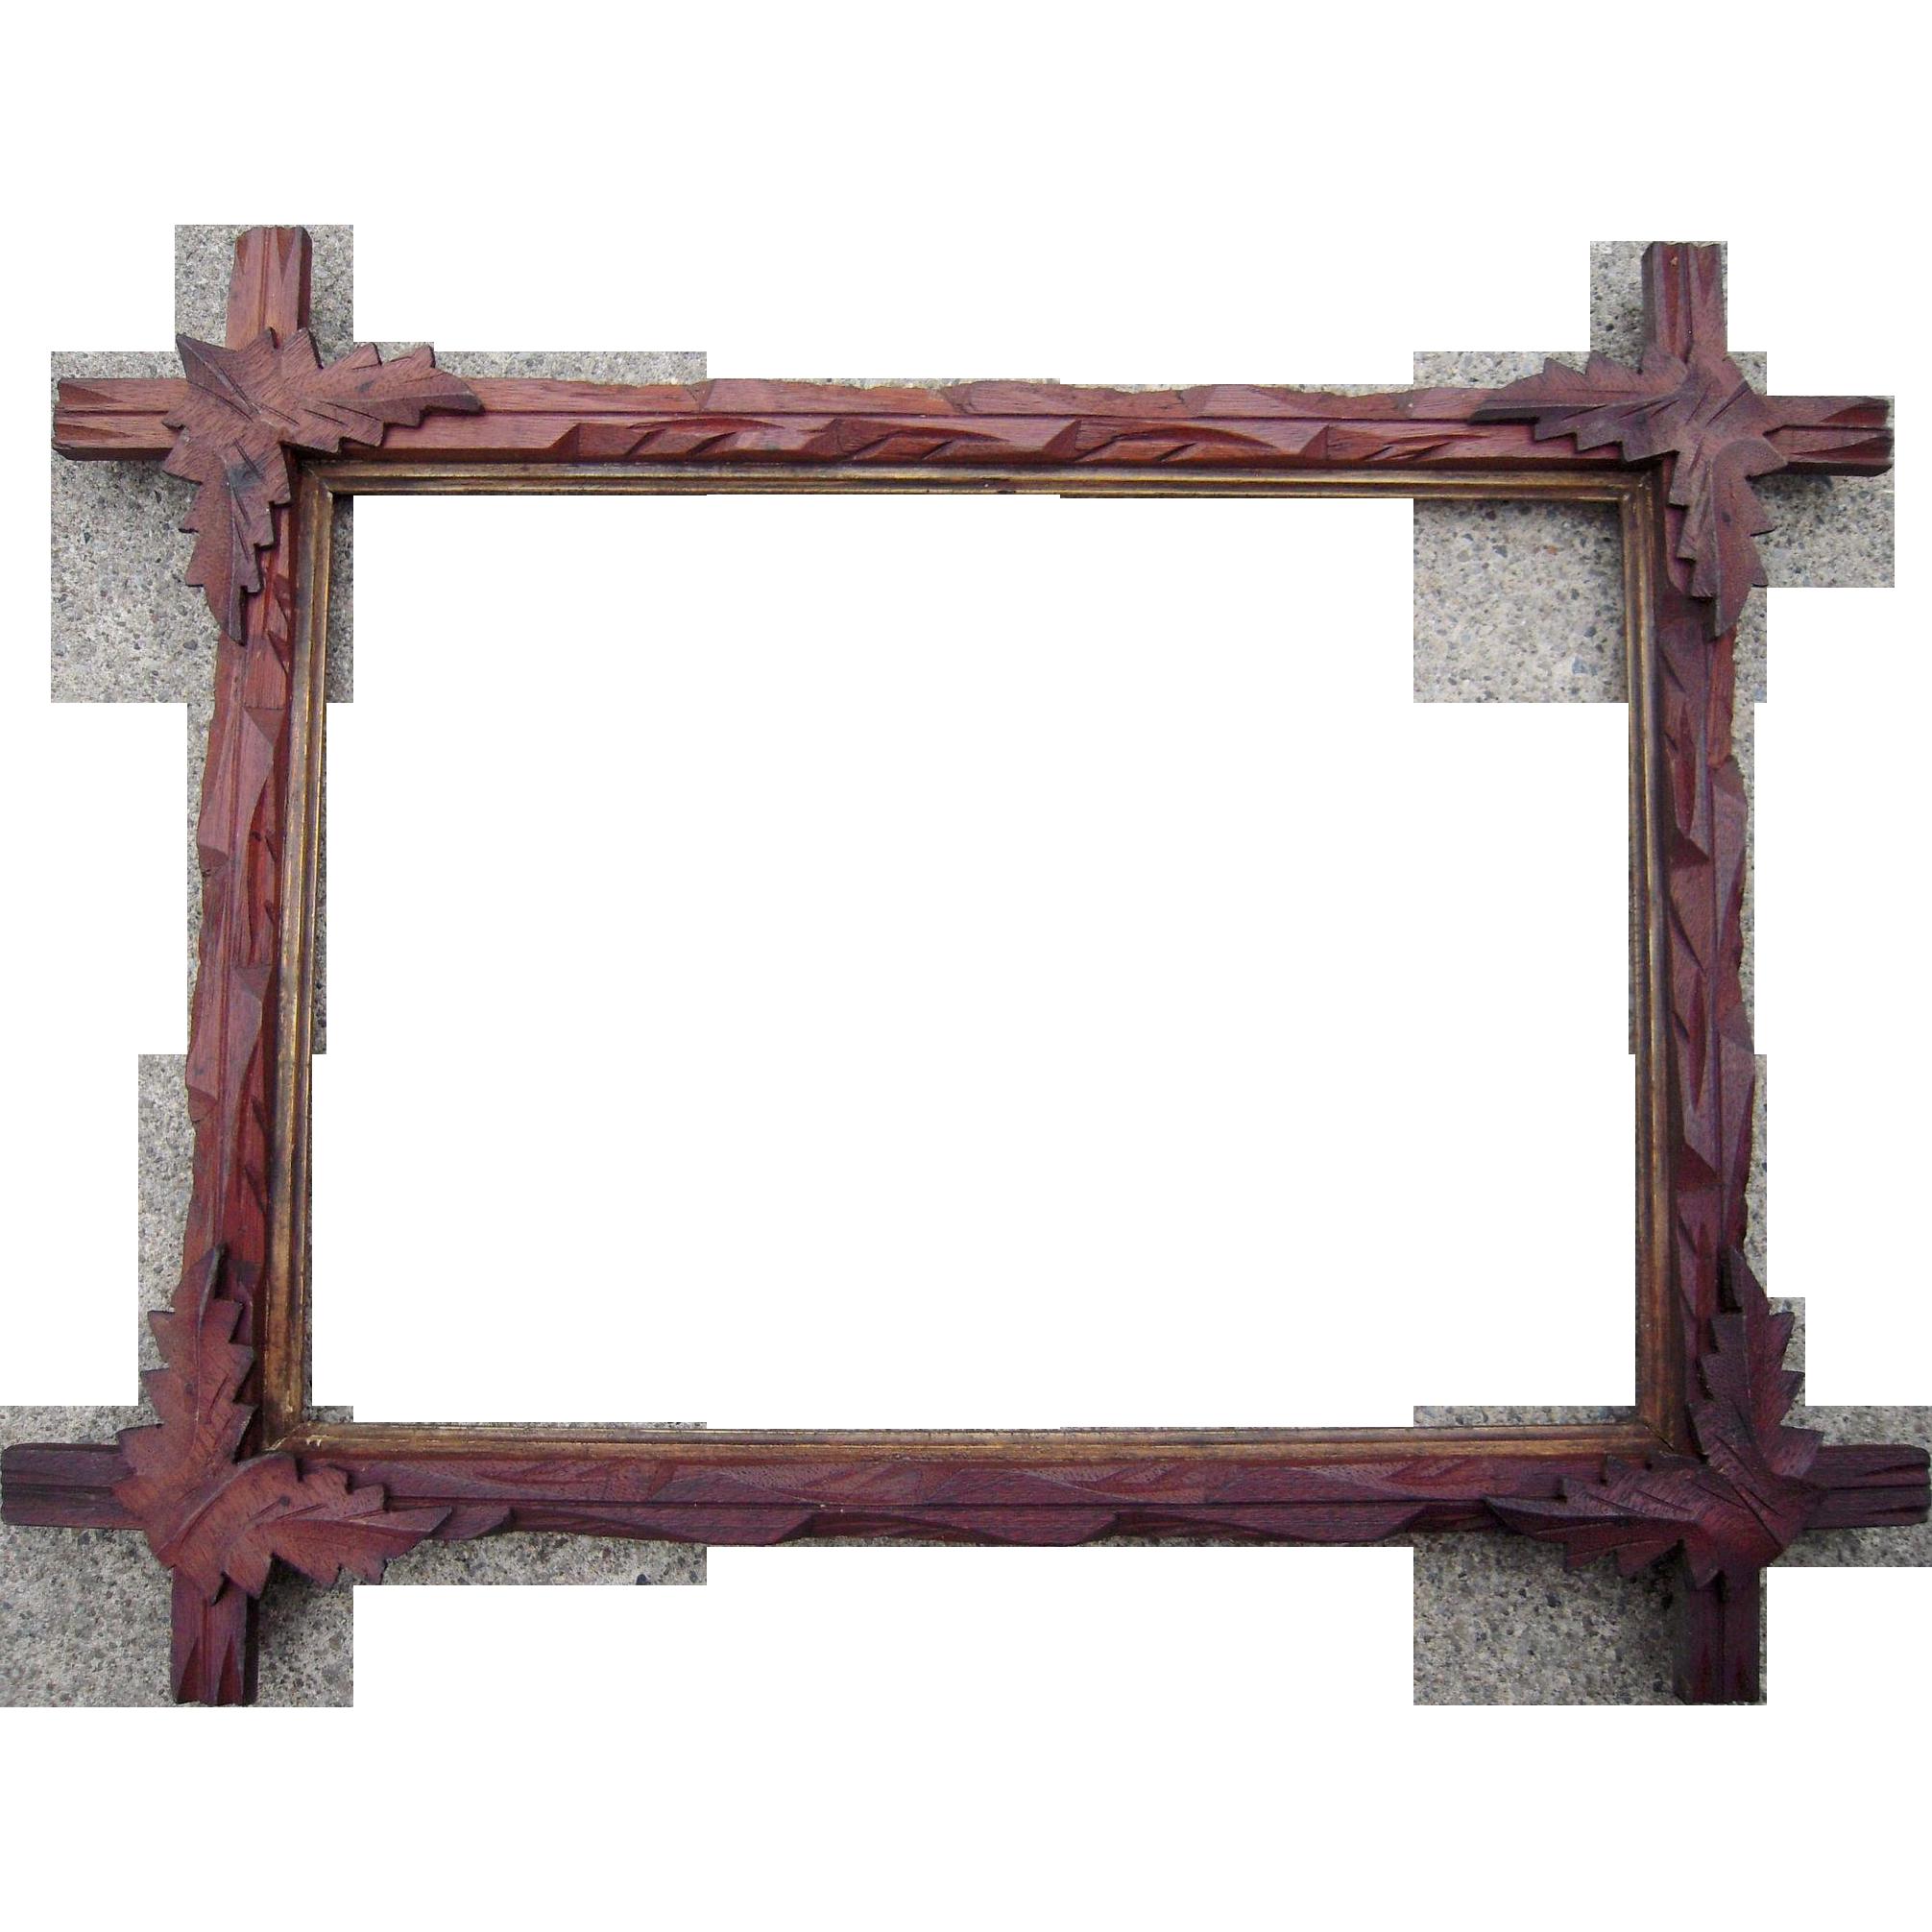 carved walnut picture frame w corner leaves 10 x 14 1 from bluesprucerugsandantiques on ruby lane. Black Bedroom Furniture Sets. Home Design Ideas